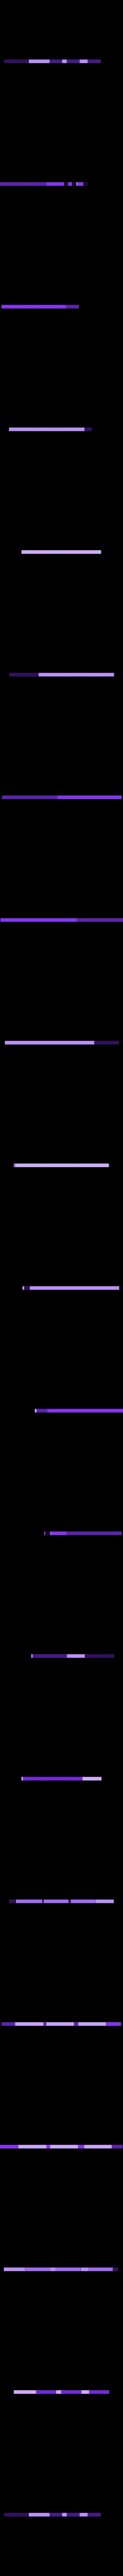 cote 2.stl Download STL file Module for mini drill and c is accessory N ° 2 • 3D printer model, prusai33